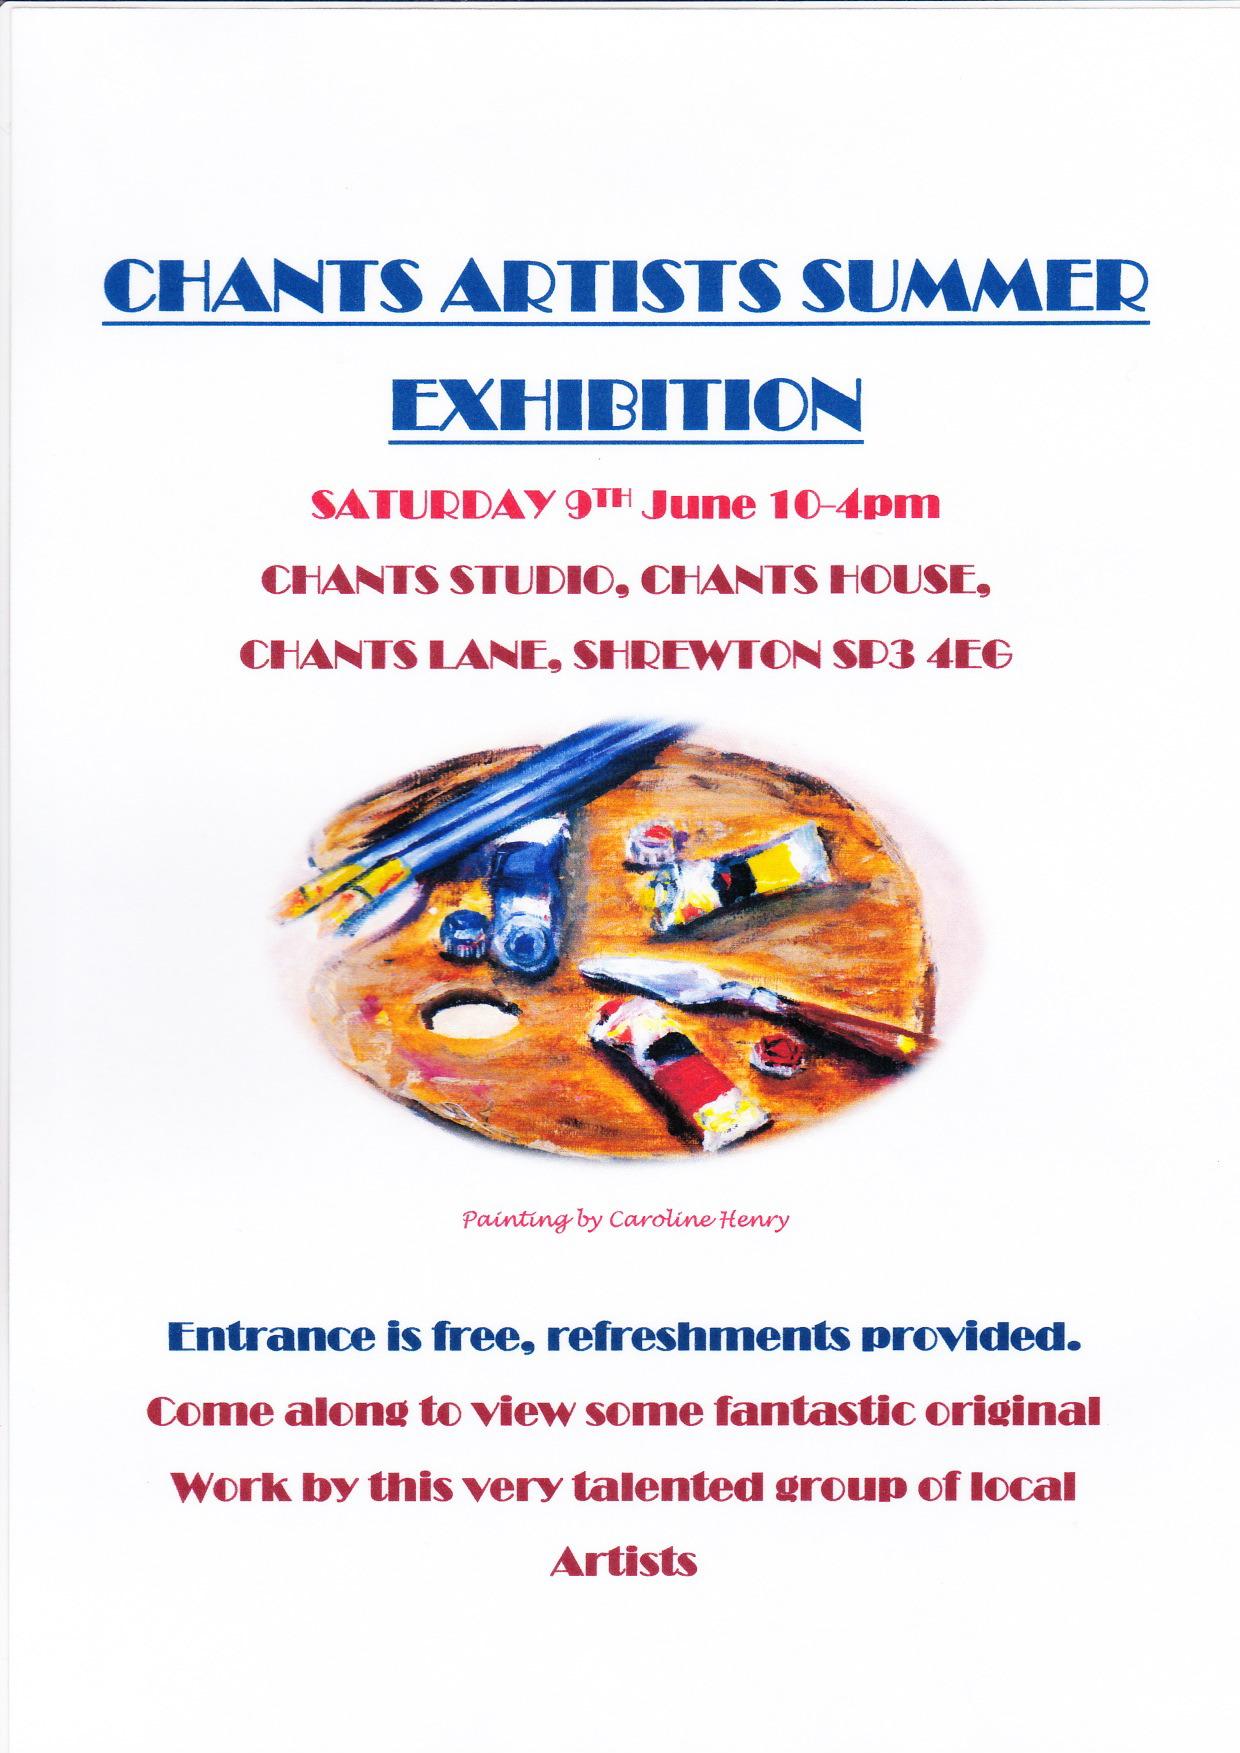 2018-06-09 Chants Artists